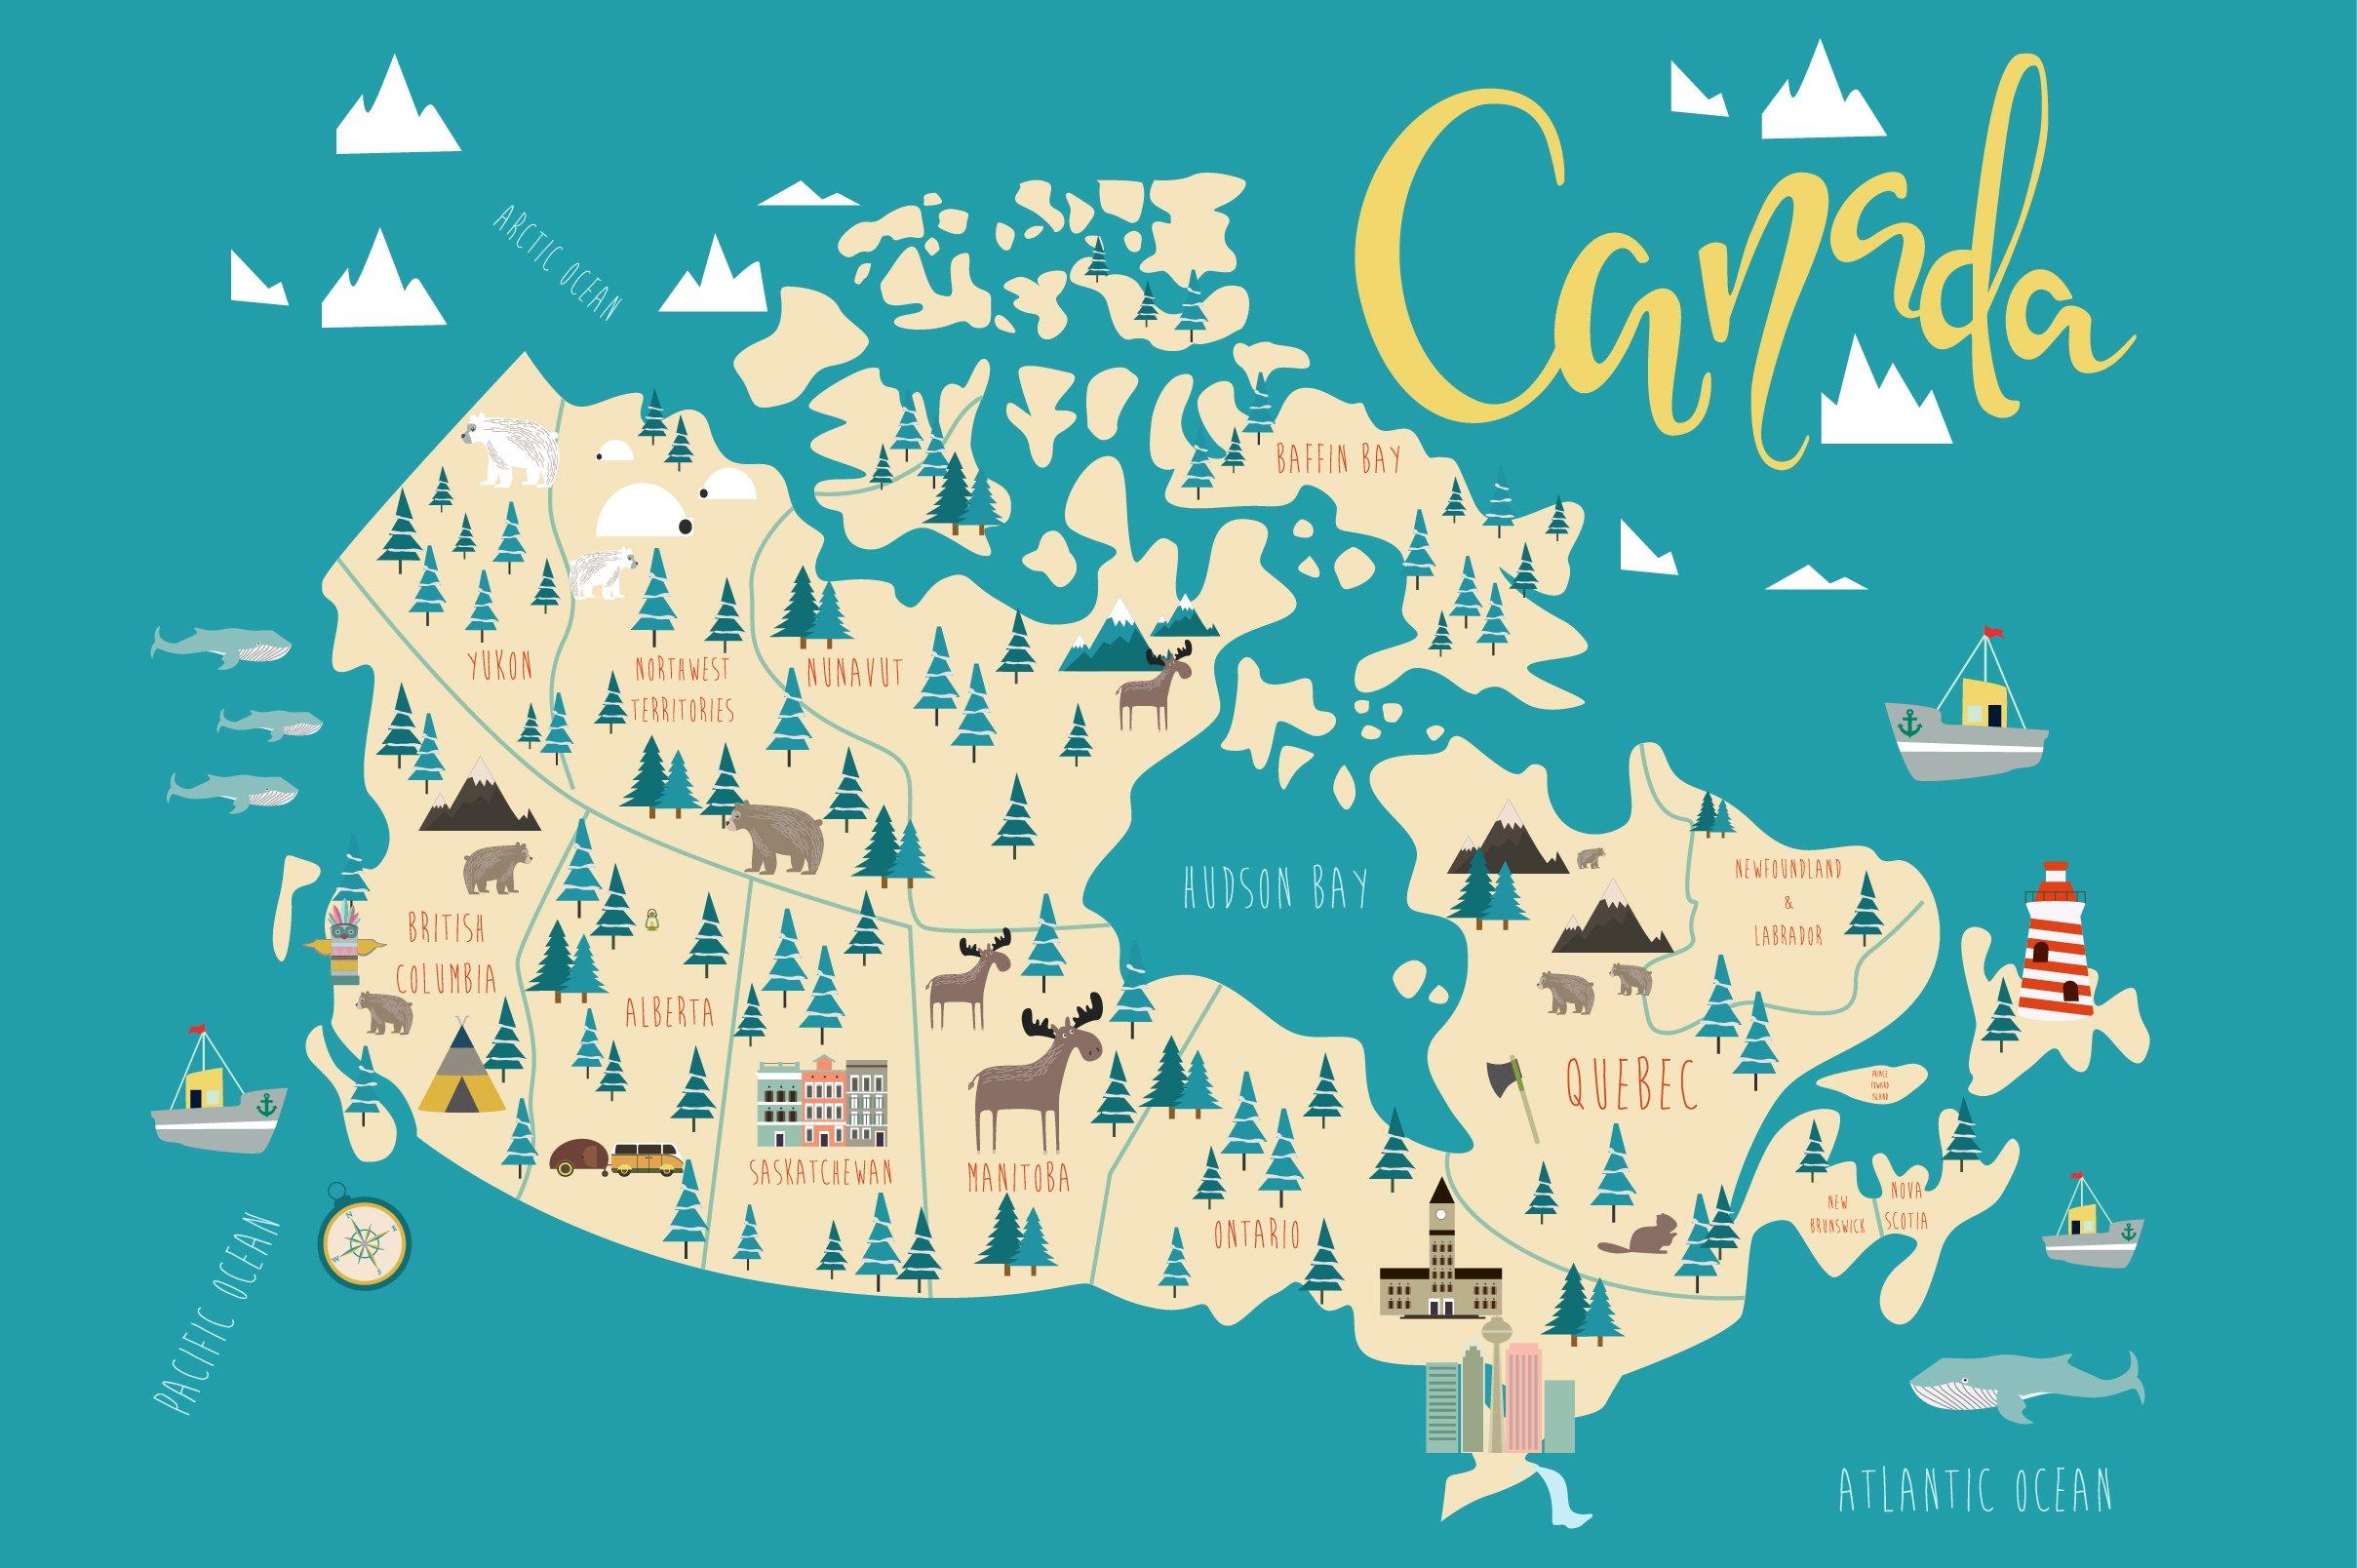 Canada Map Illustration Illustration of Canada map | Pre Designed Illustrator Graphics